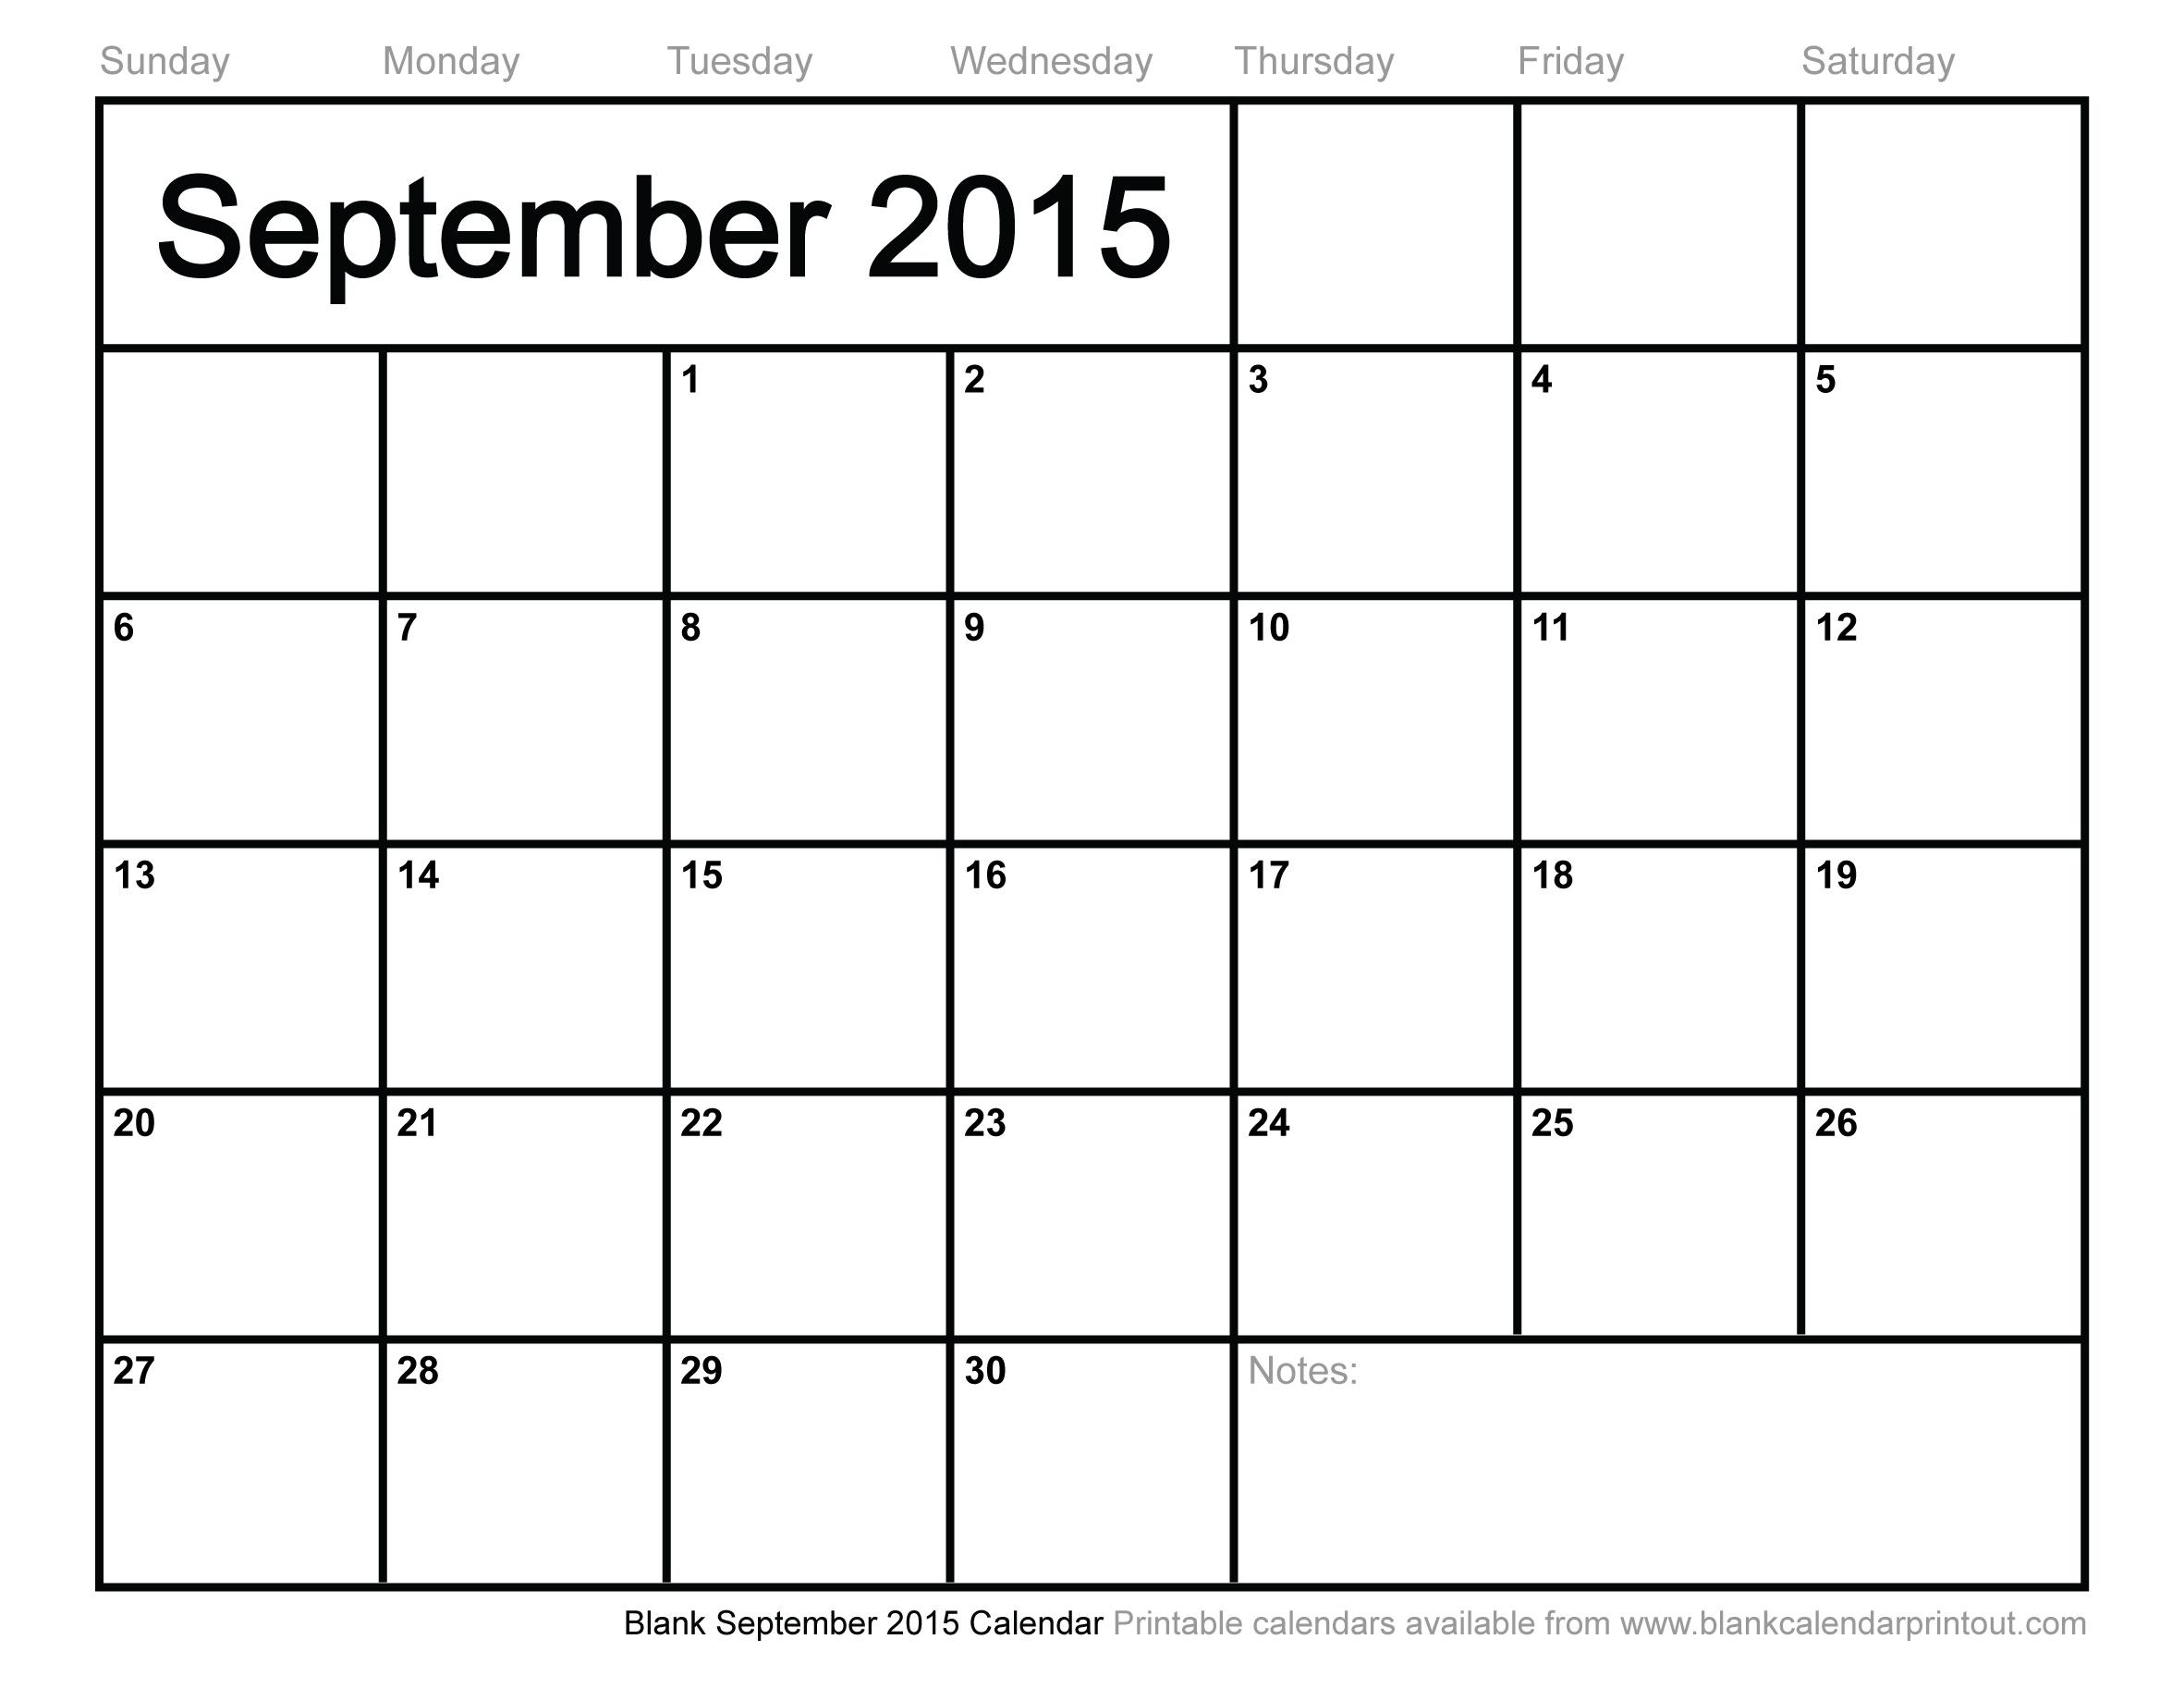 Blank September 2015 Calendar To Print throughout Calendar For Month Of September